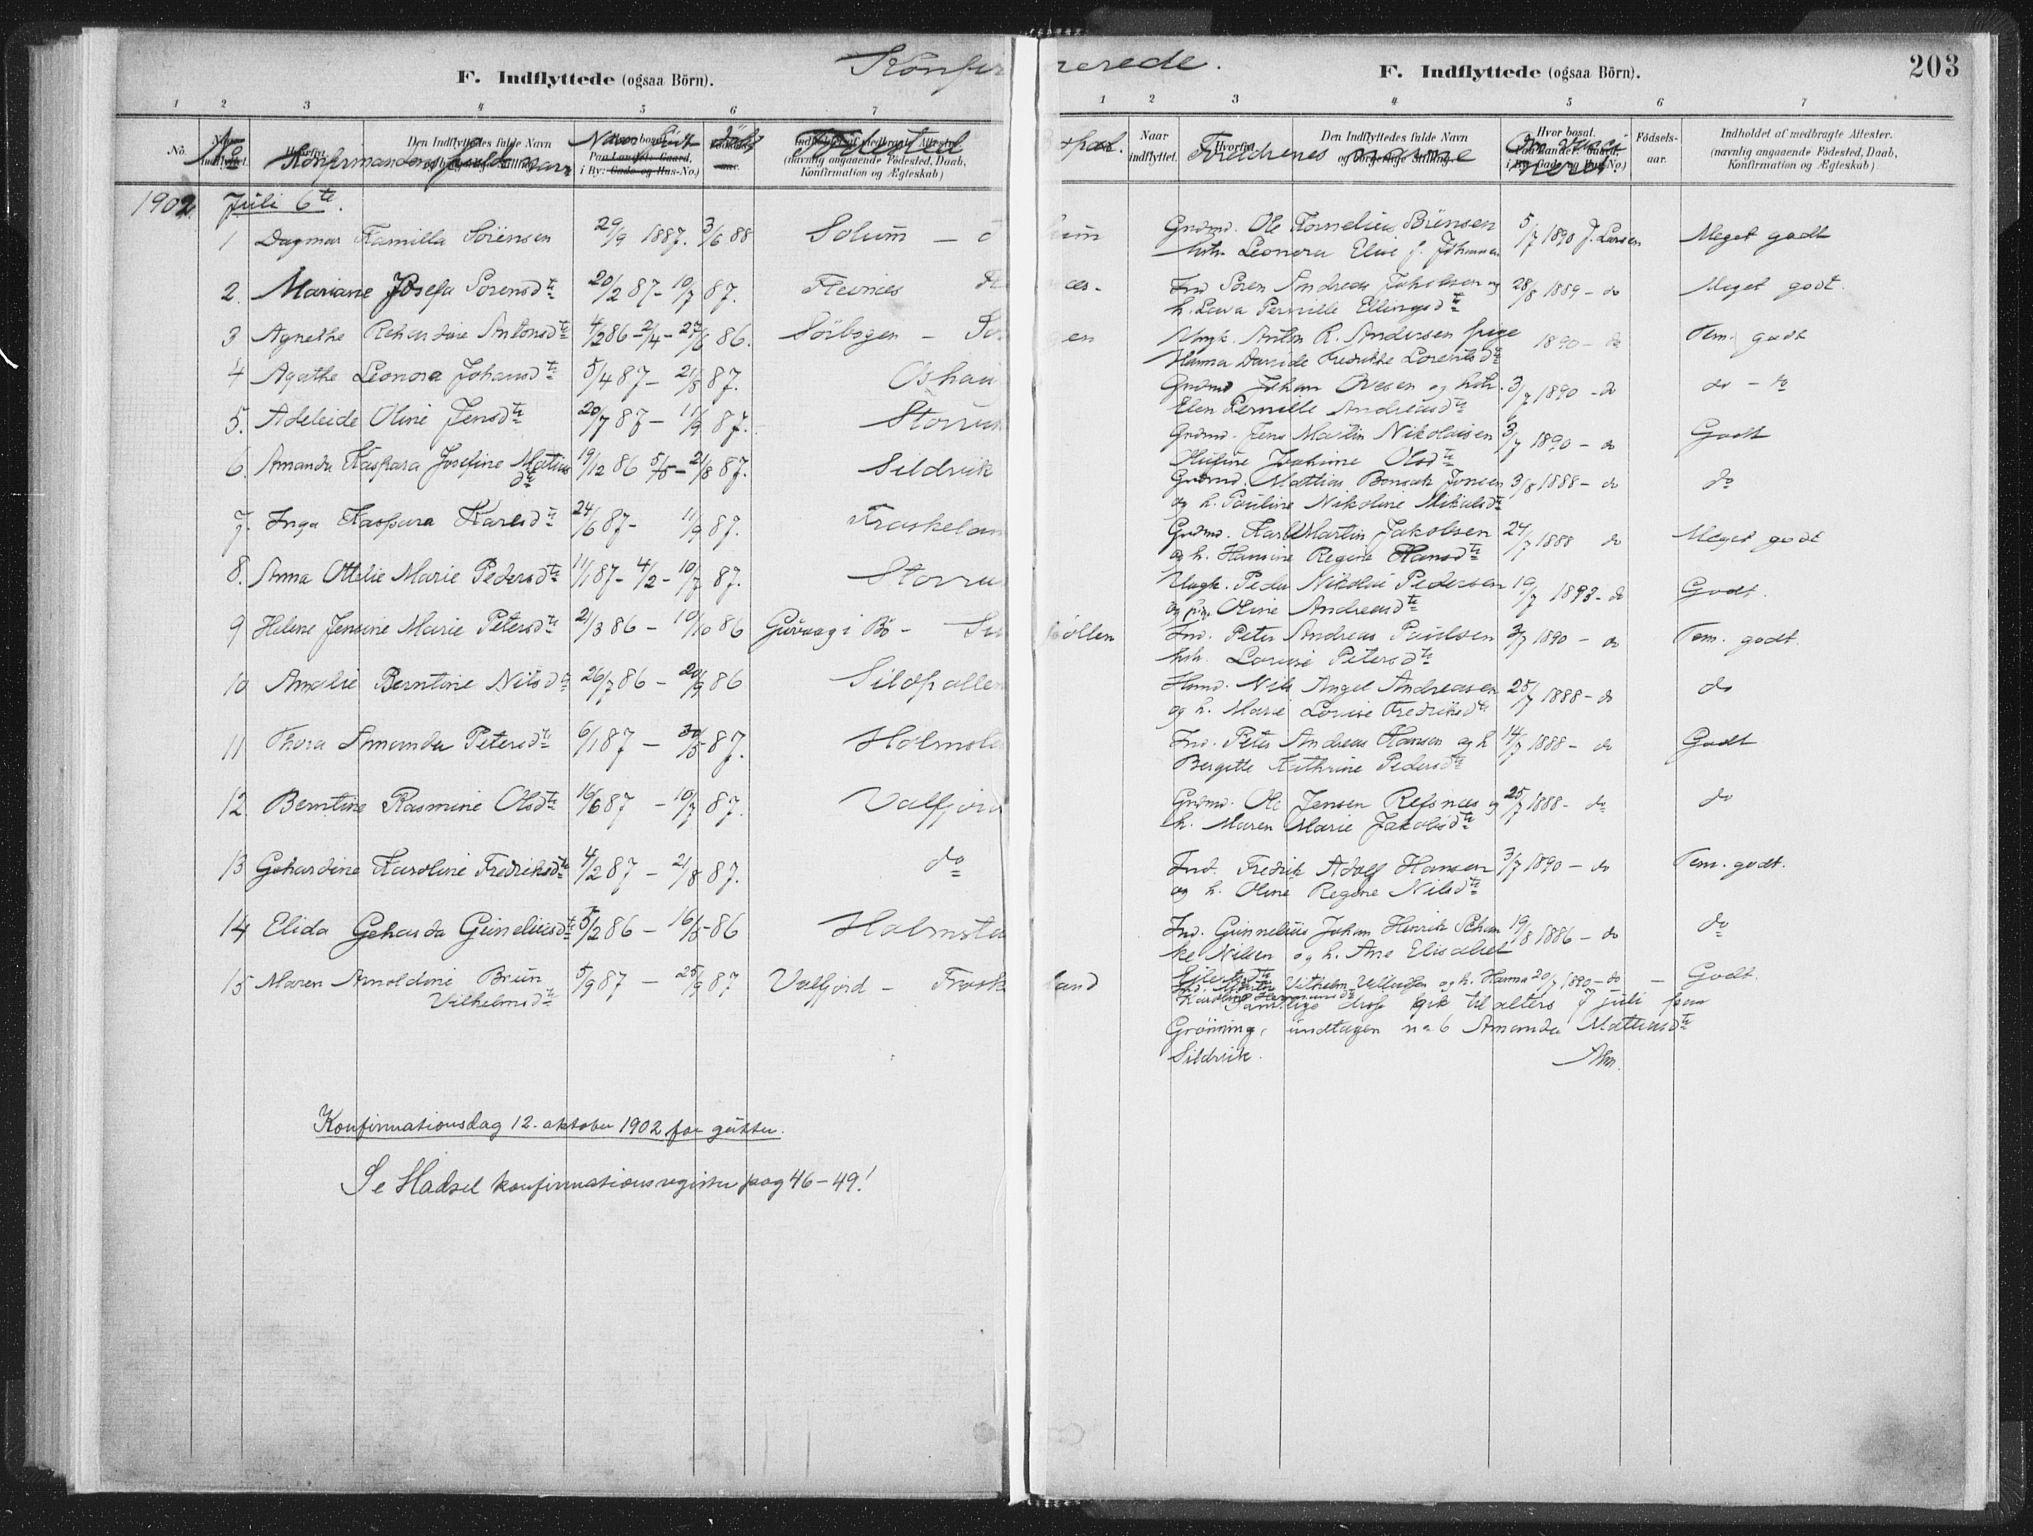 SAT, Ministerialprotokoller, klokkerbøker og fødselsregistre - Nordland, 890/L1286: Ministerialbok nr. 890A01, 1882-1902, s. 203